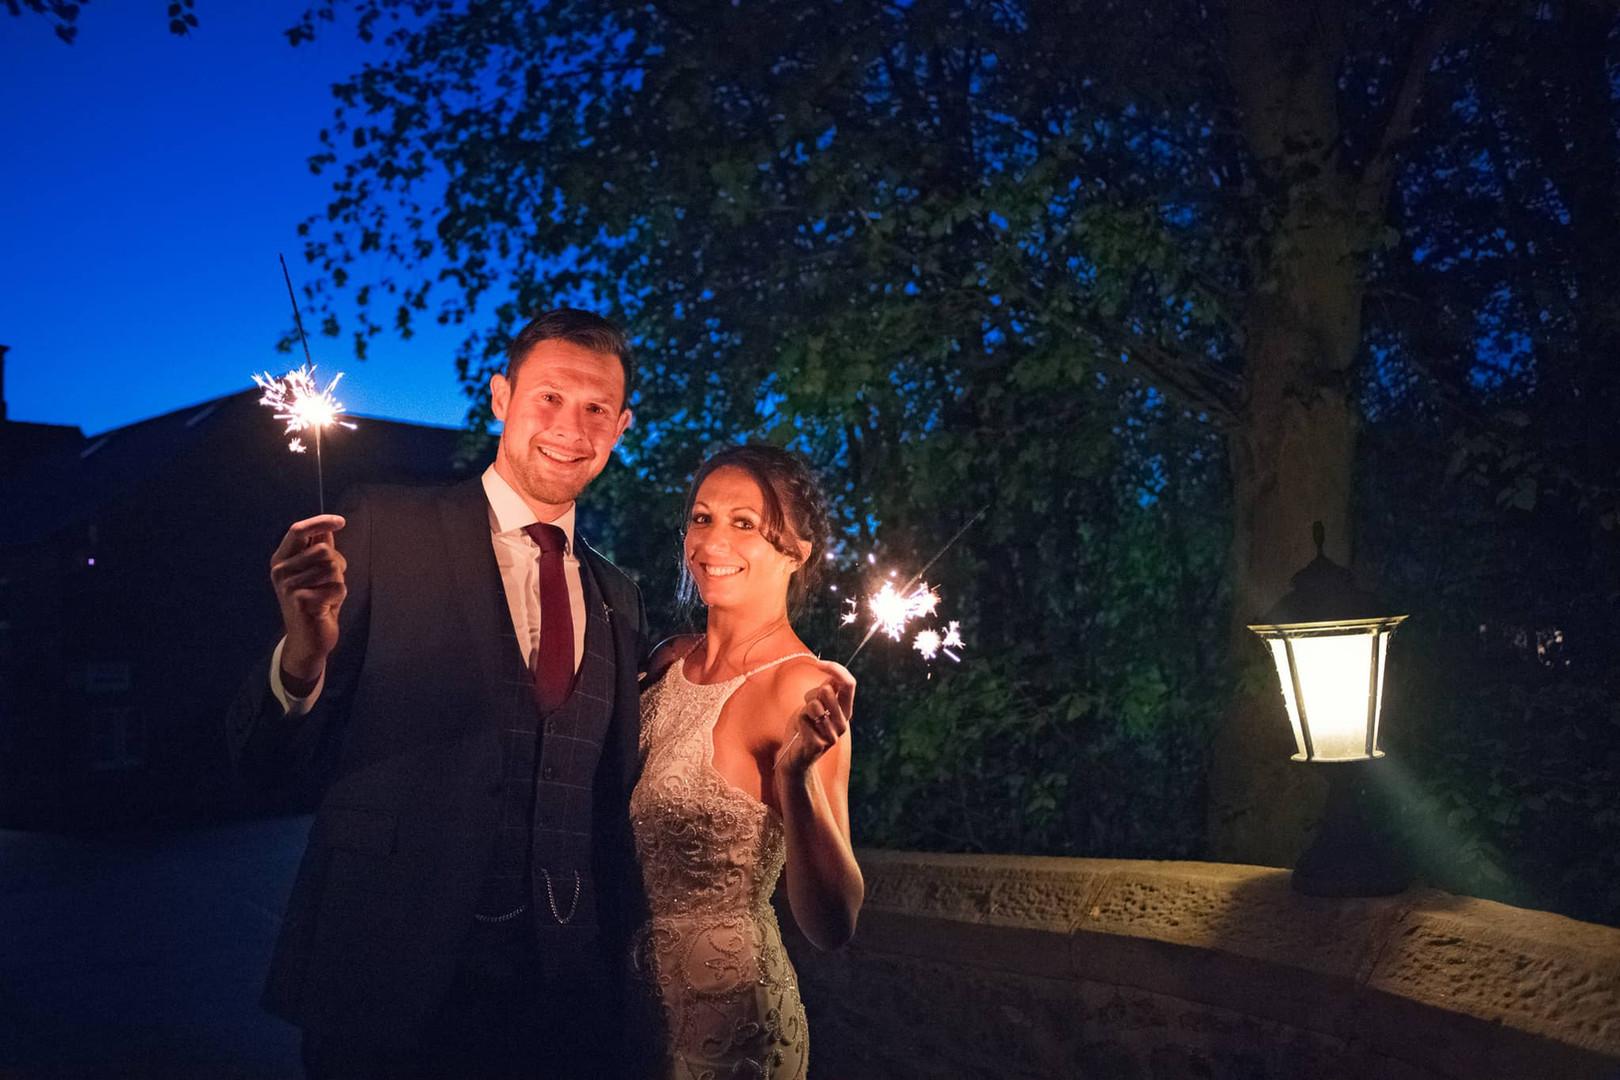 Wedding Fireworks Sparklers